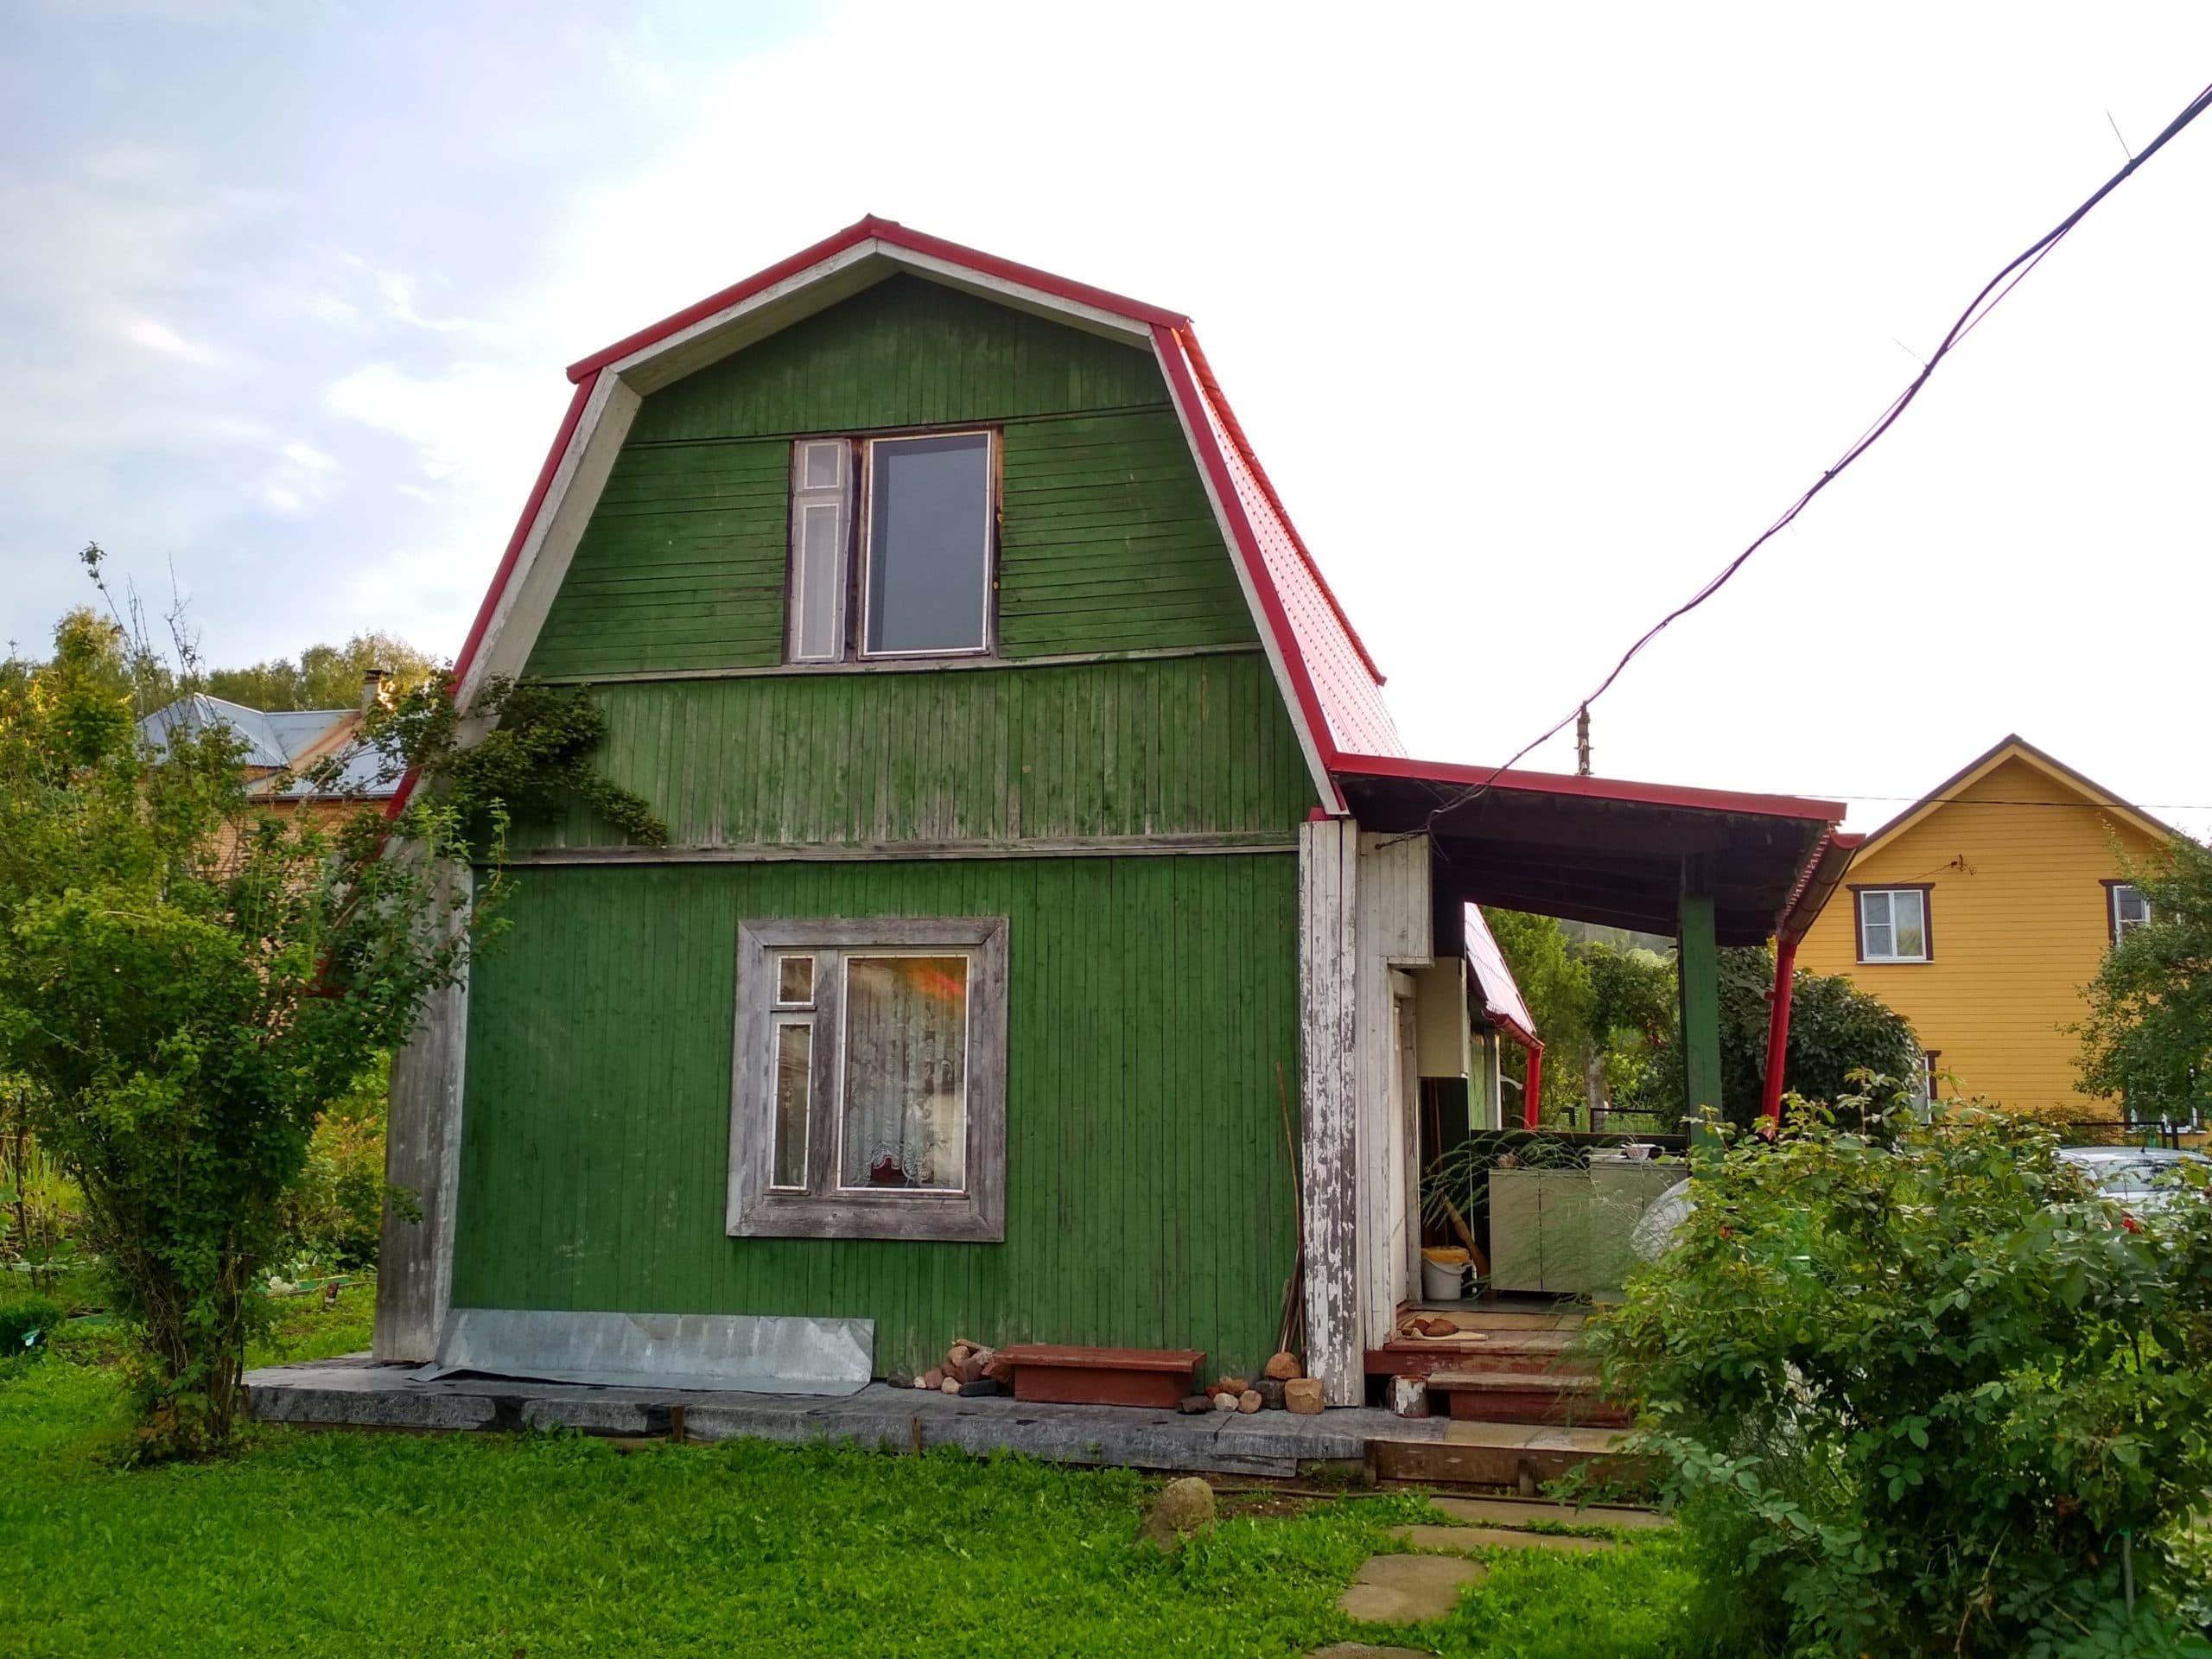 moskovskaja oblast stupinskii raion staraja dacha scaled - Монтаж сайдинга